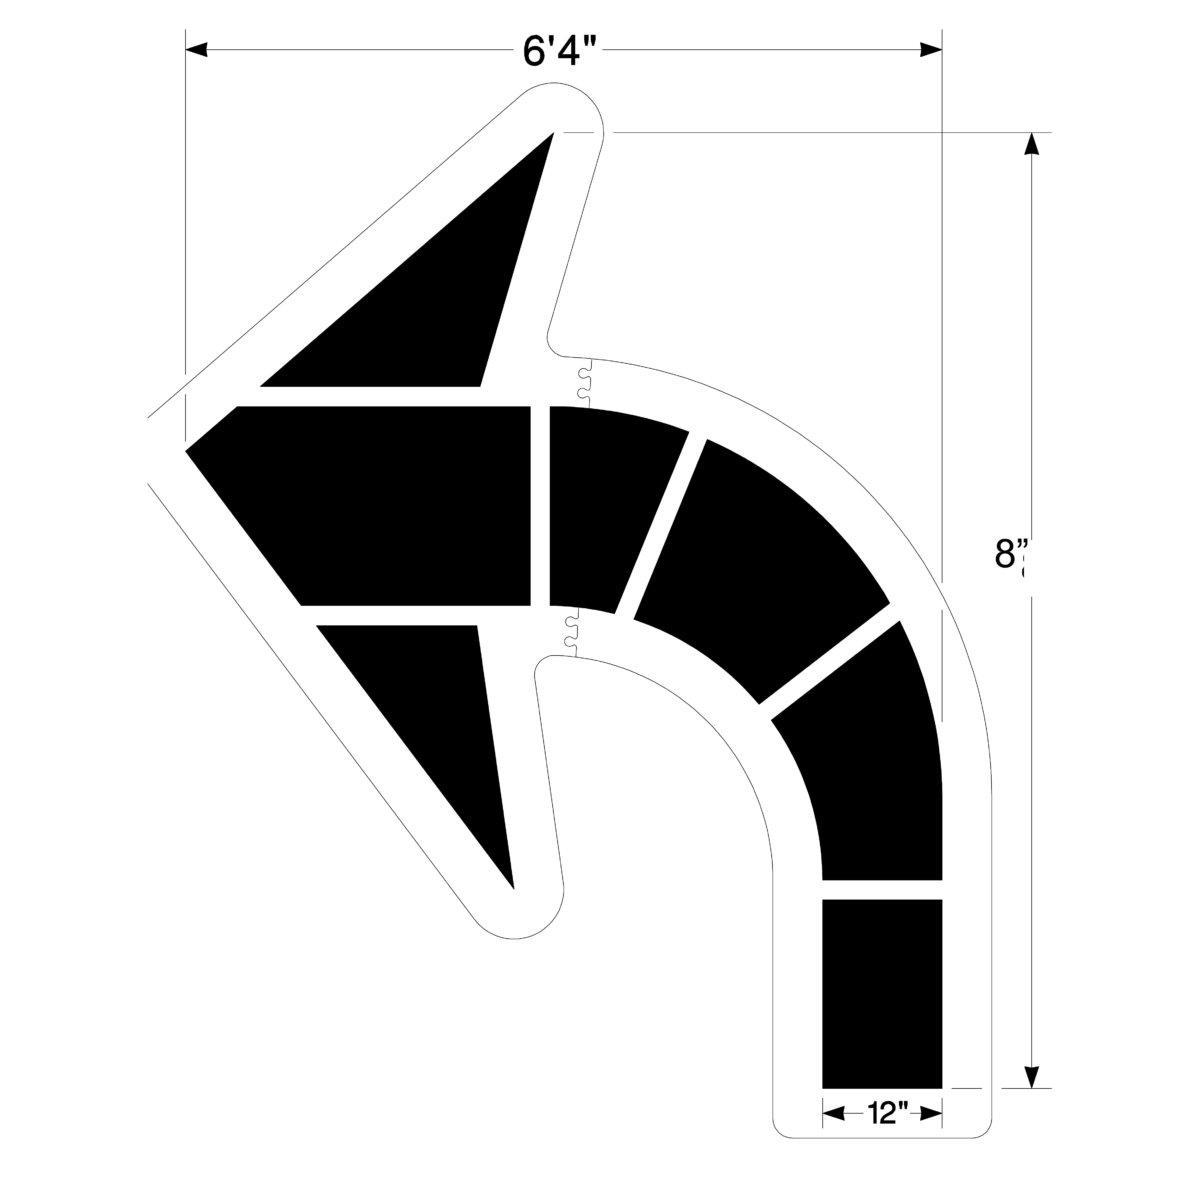 large federal curved arrow stencil. Black Bedroom Furniture Sets. Home Design Ideas